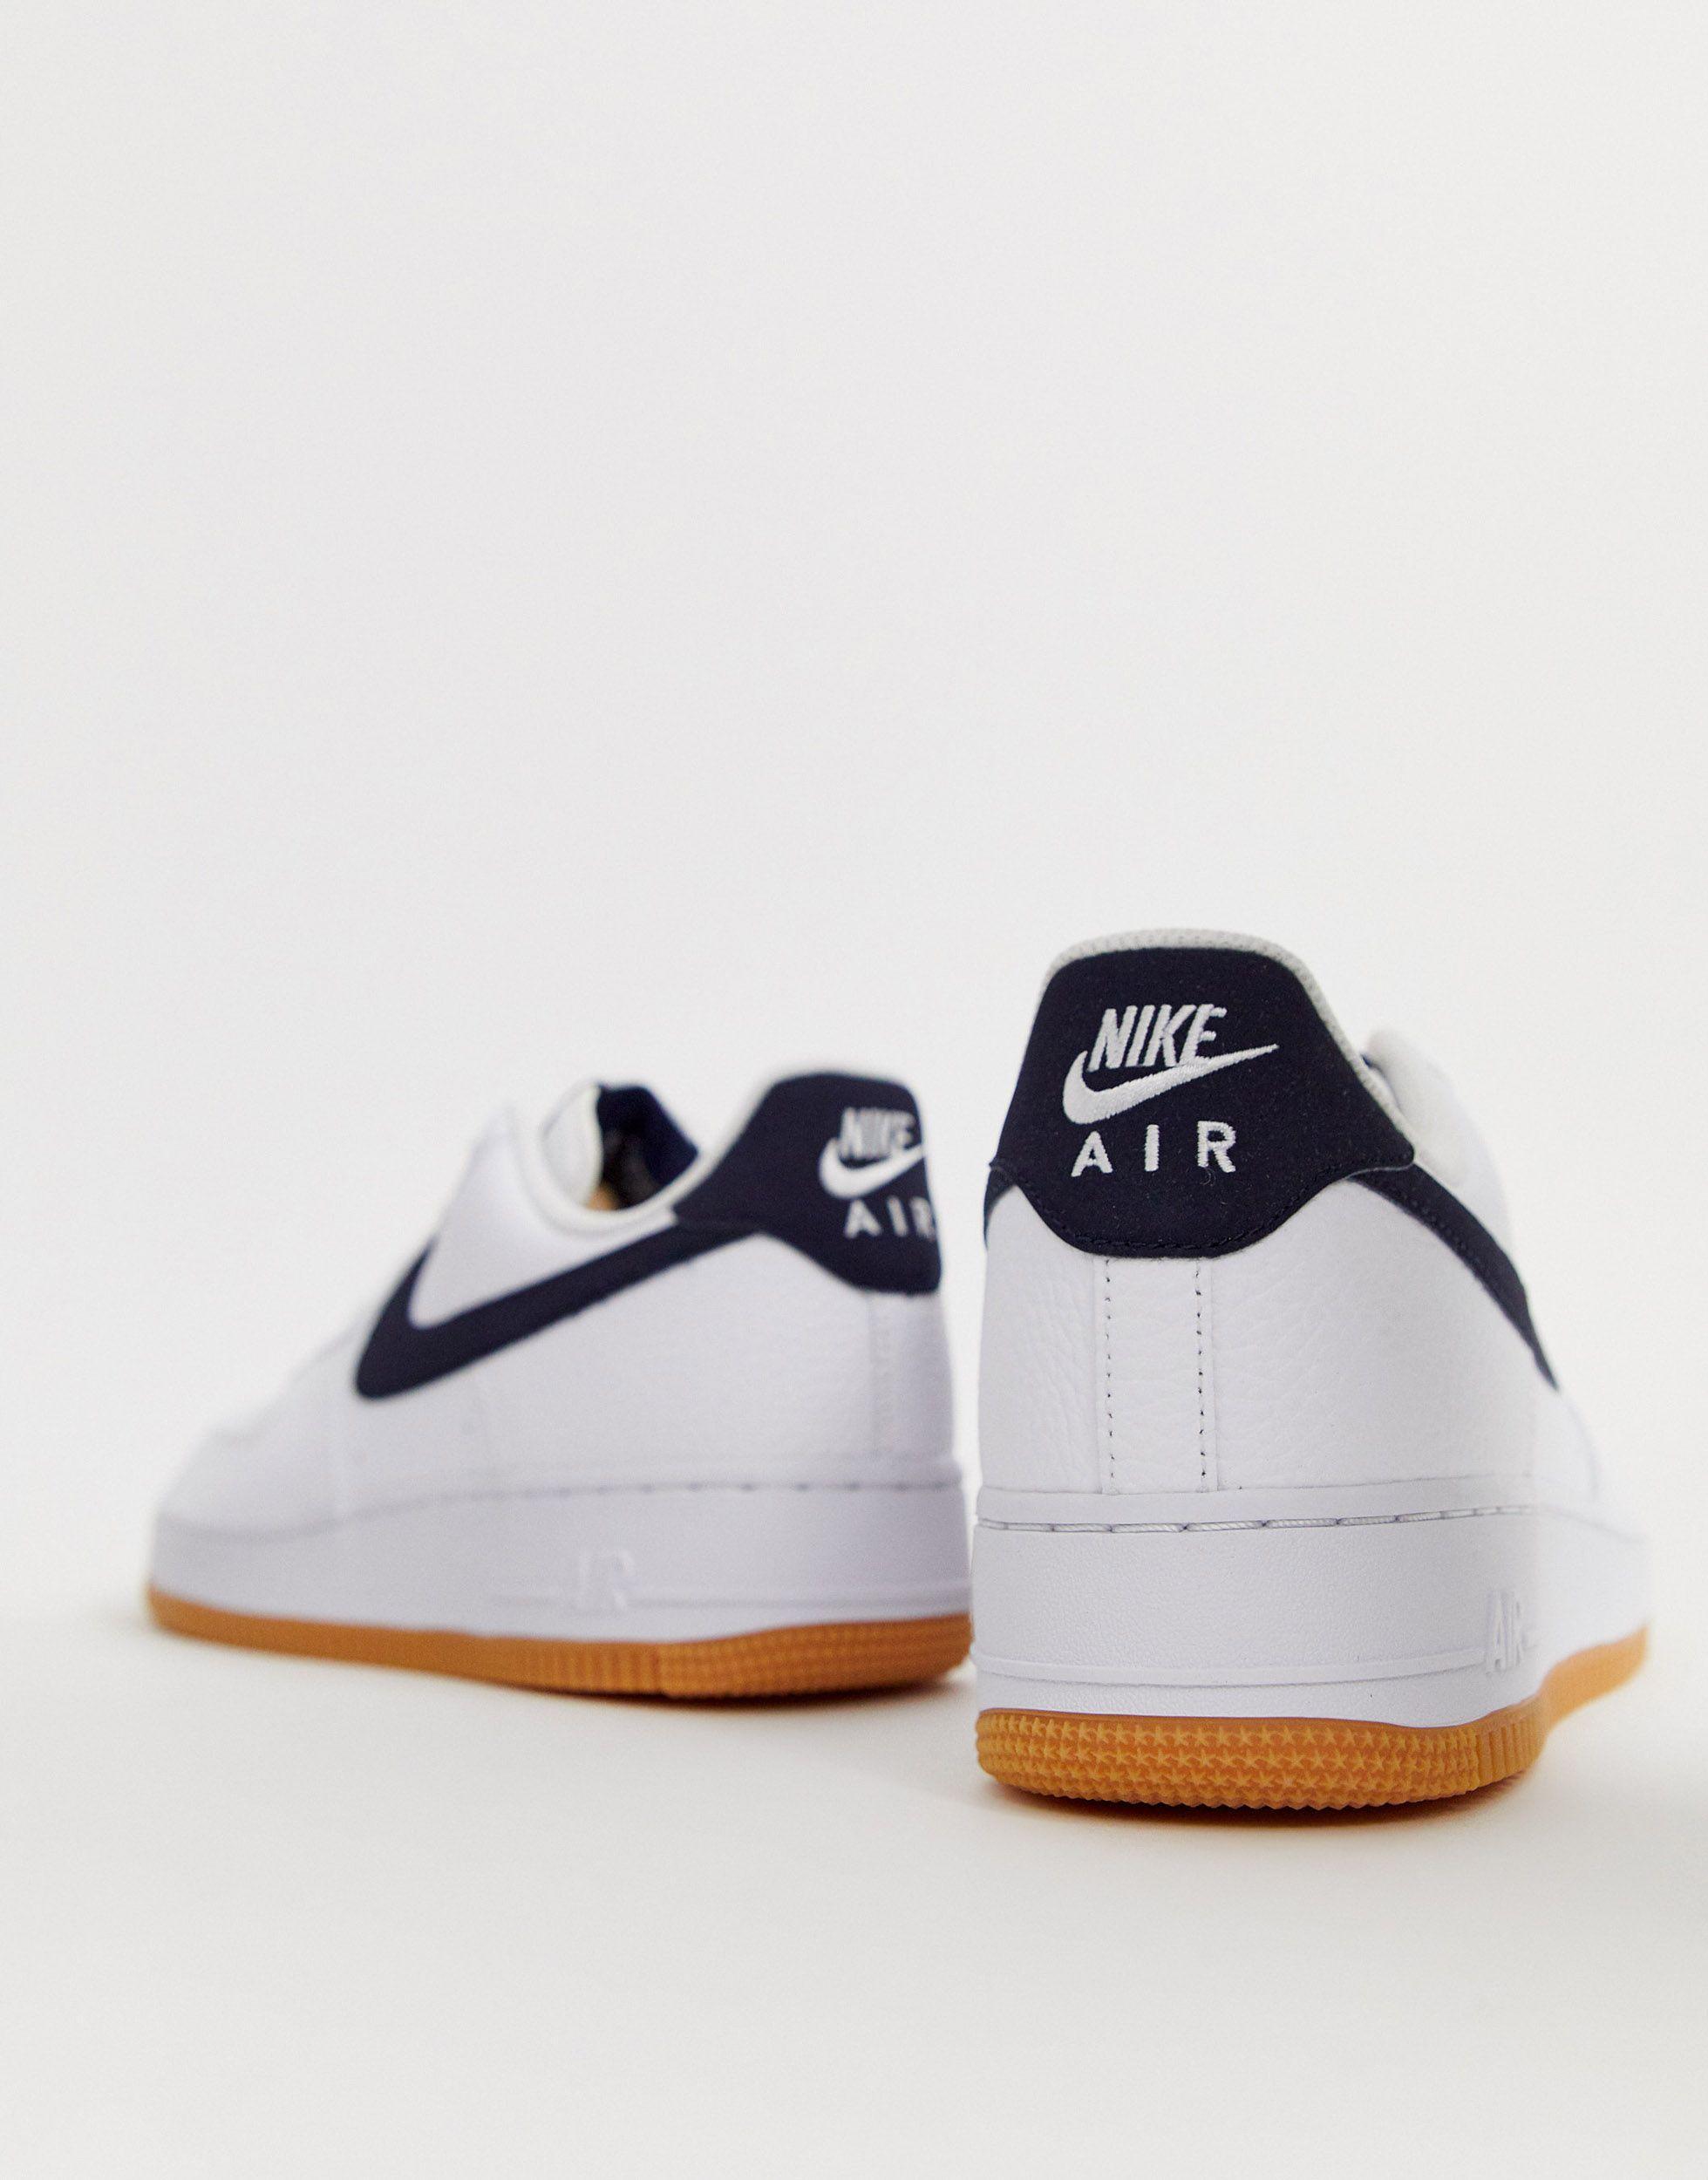 nike air force 1 gum sole Shop Clothing